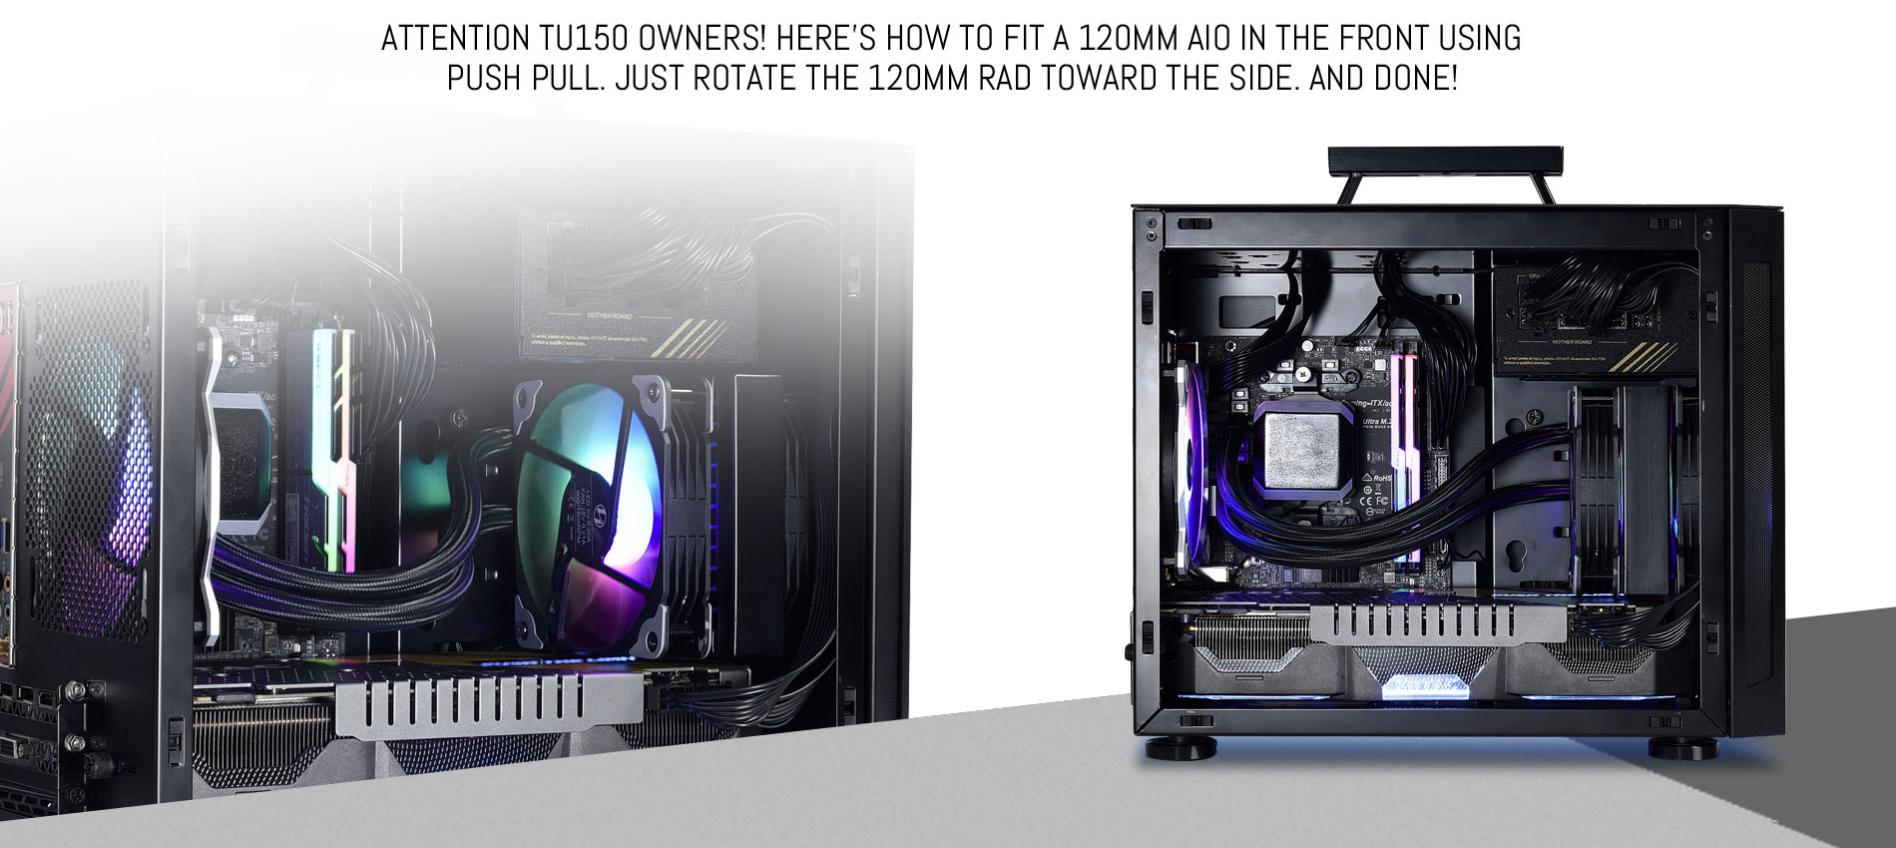 Case Lianli TU150 ((Mini Tower/Màu Bạc) giới thiệu 3